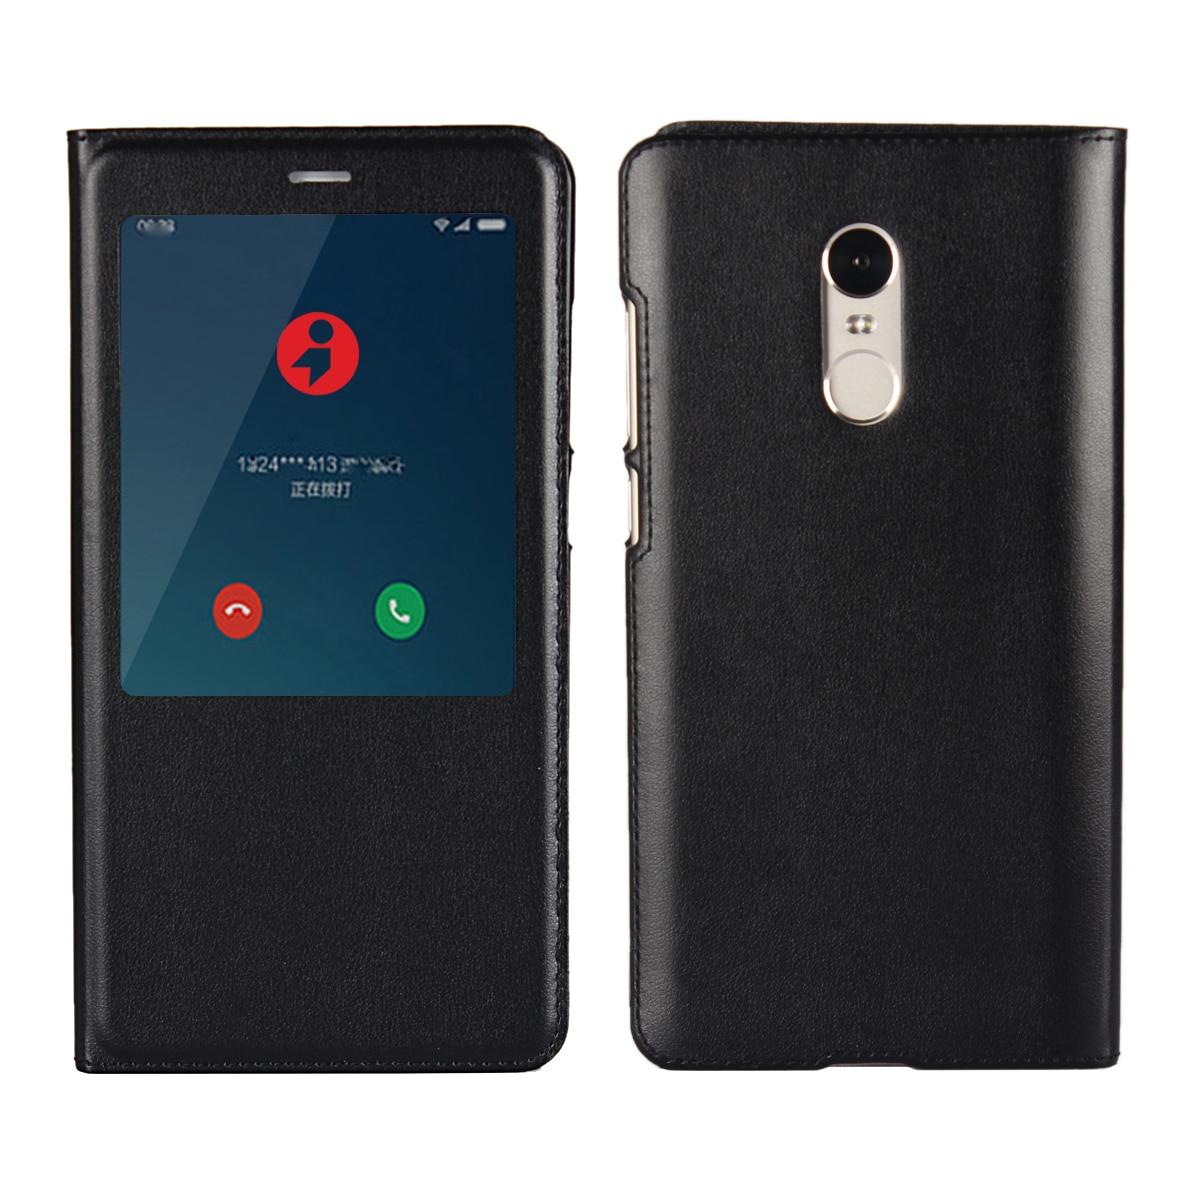 Ultra-fino negócio capa protetora coldre caso de telefone janela-tipo flip caso caso de couro do plutônio para xiaomi redmi note 4 4x